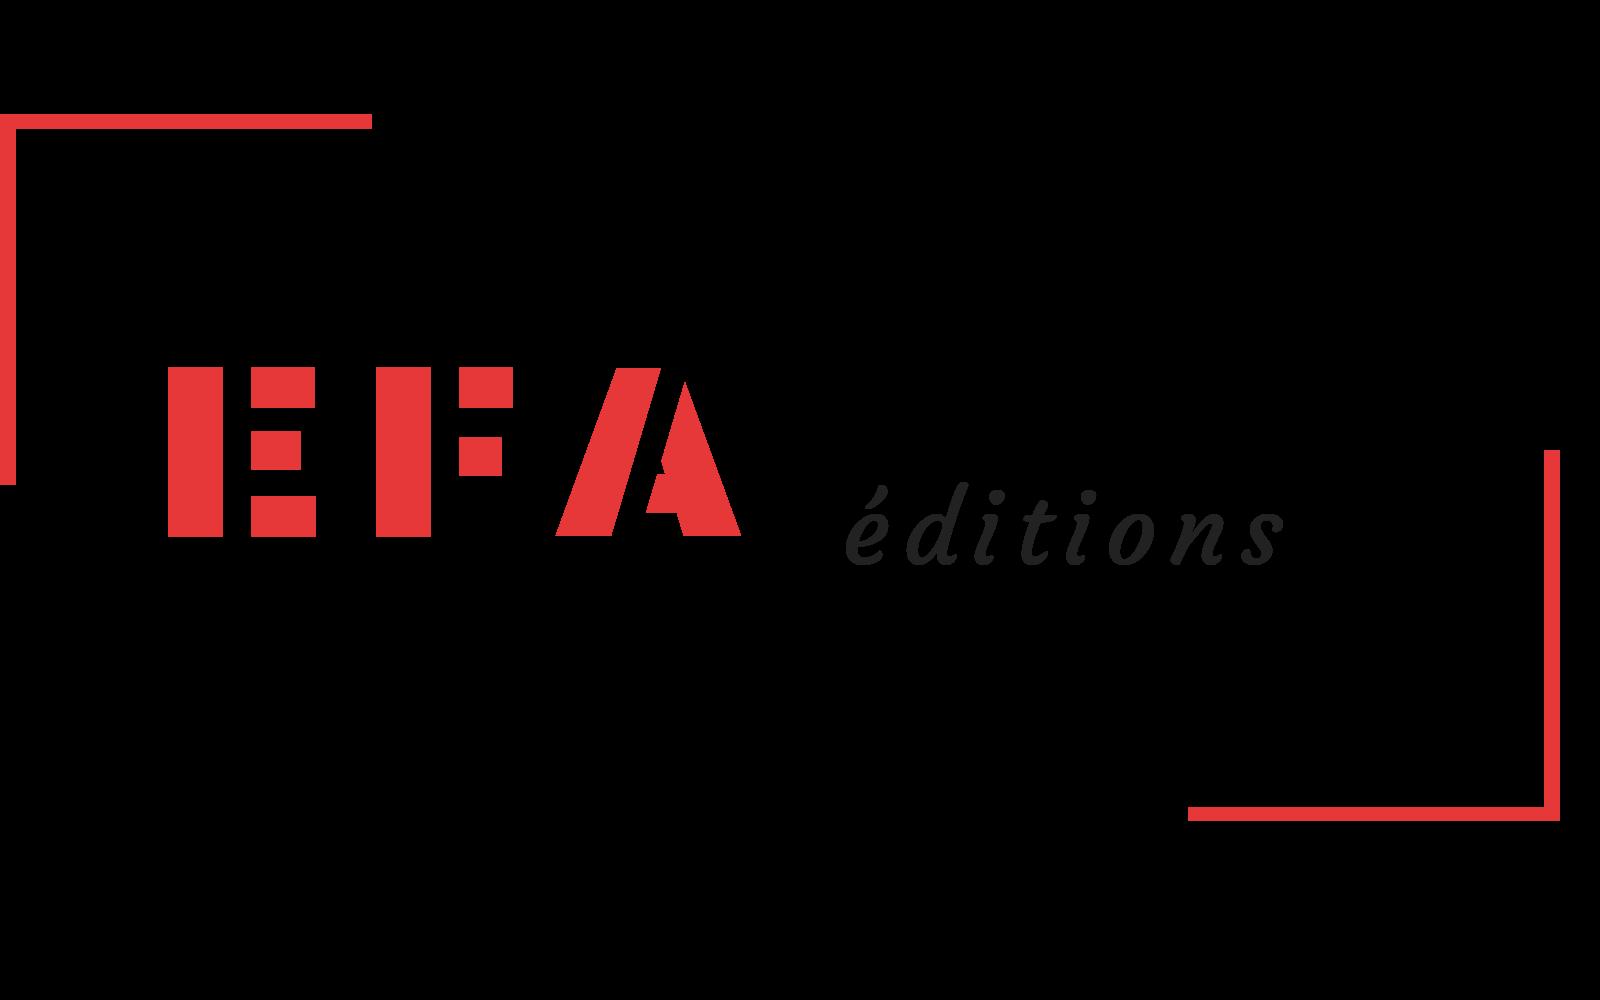 EFA Editions